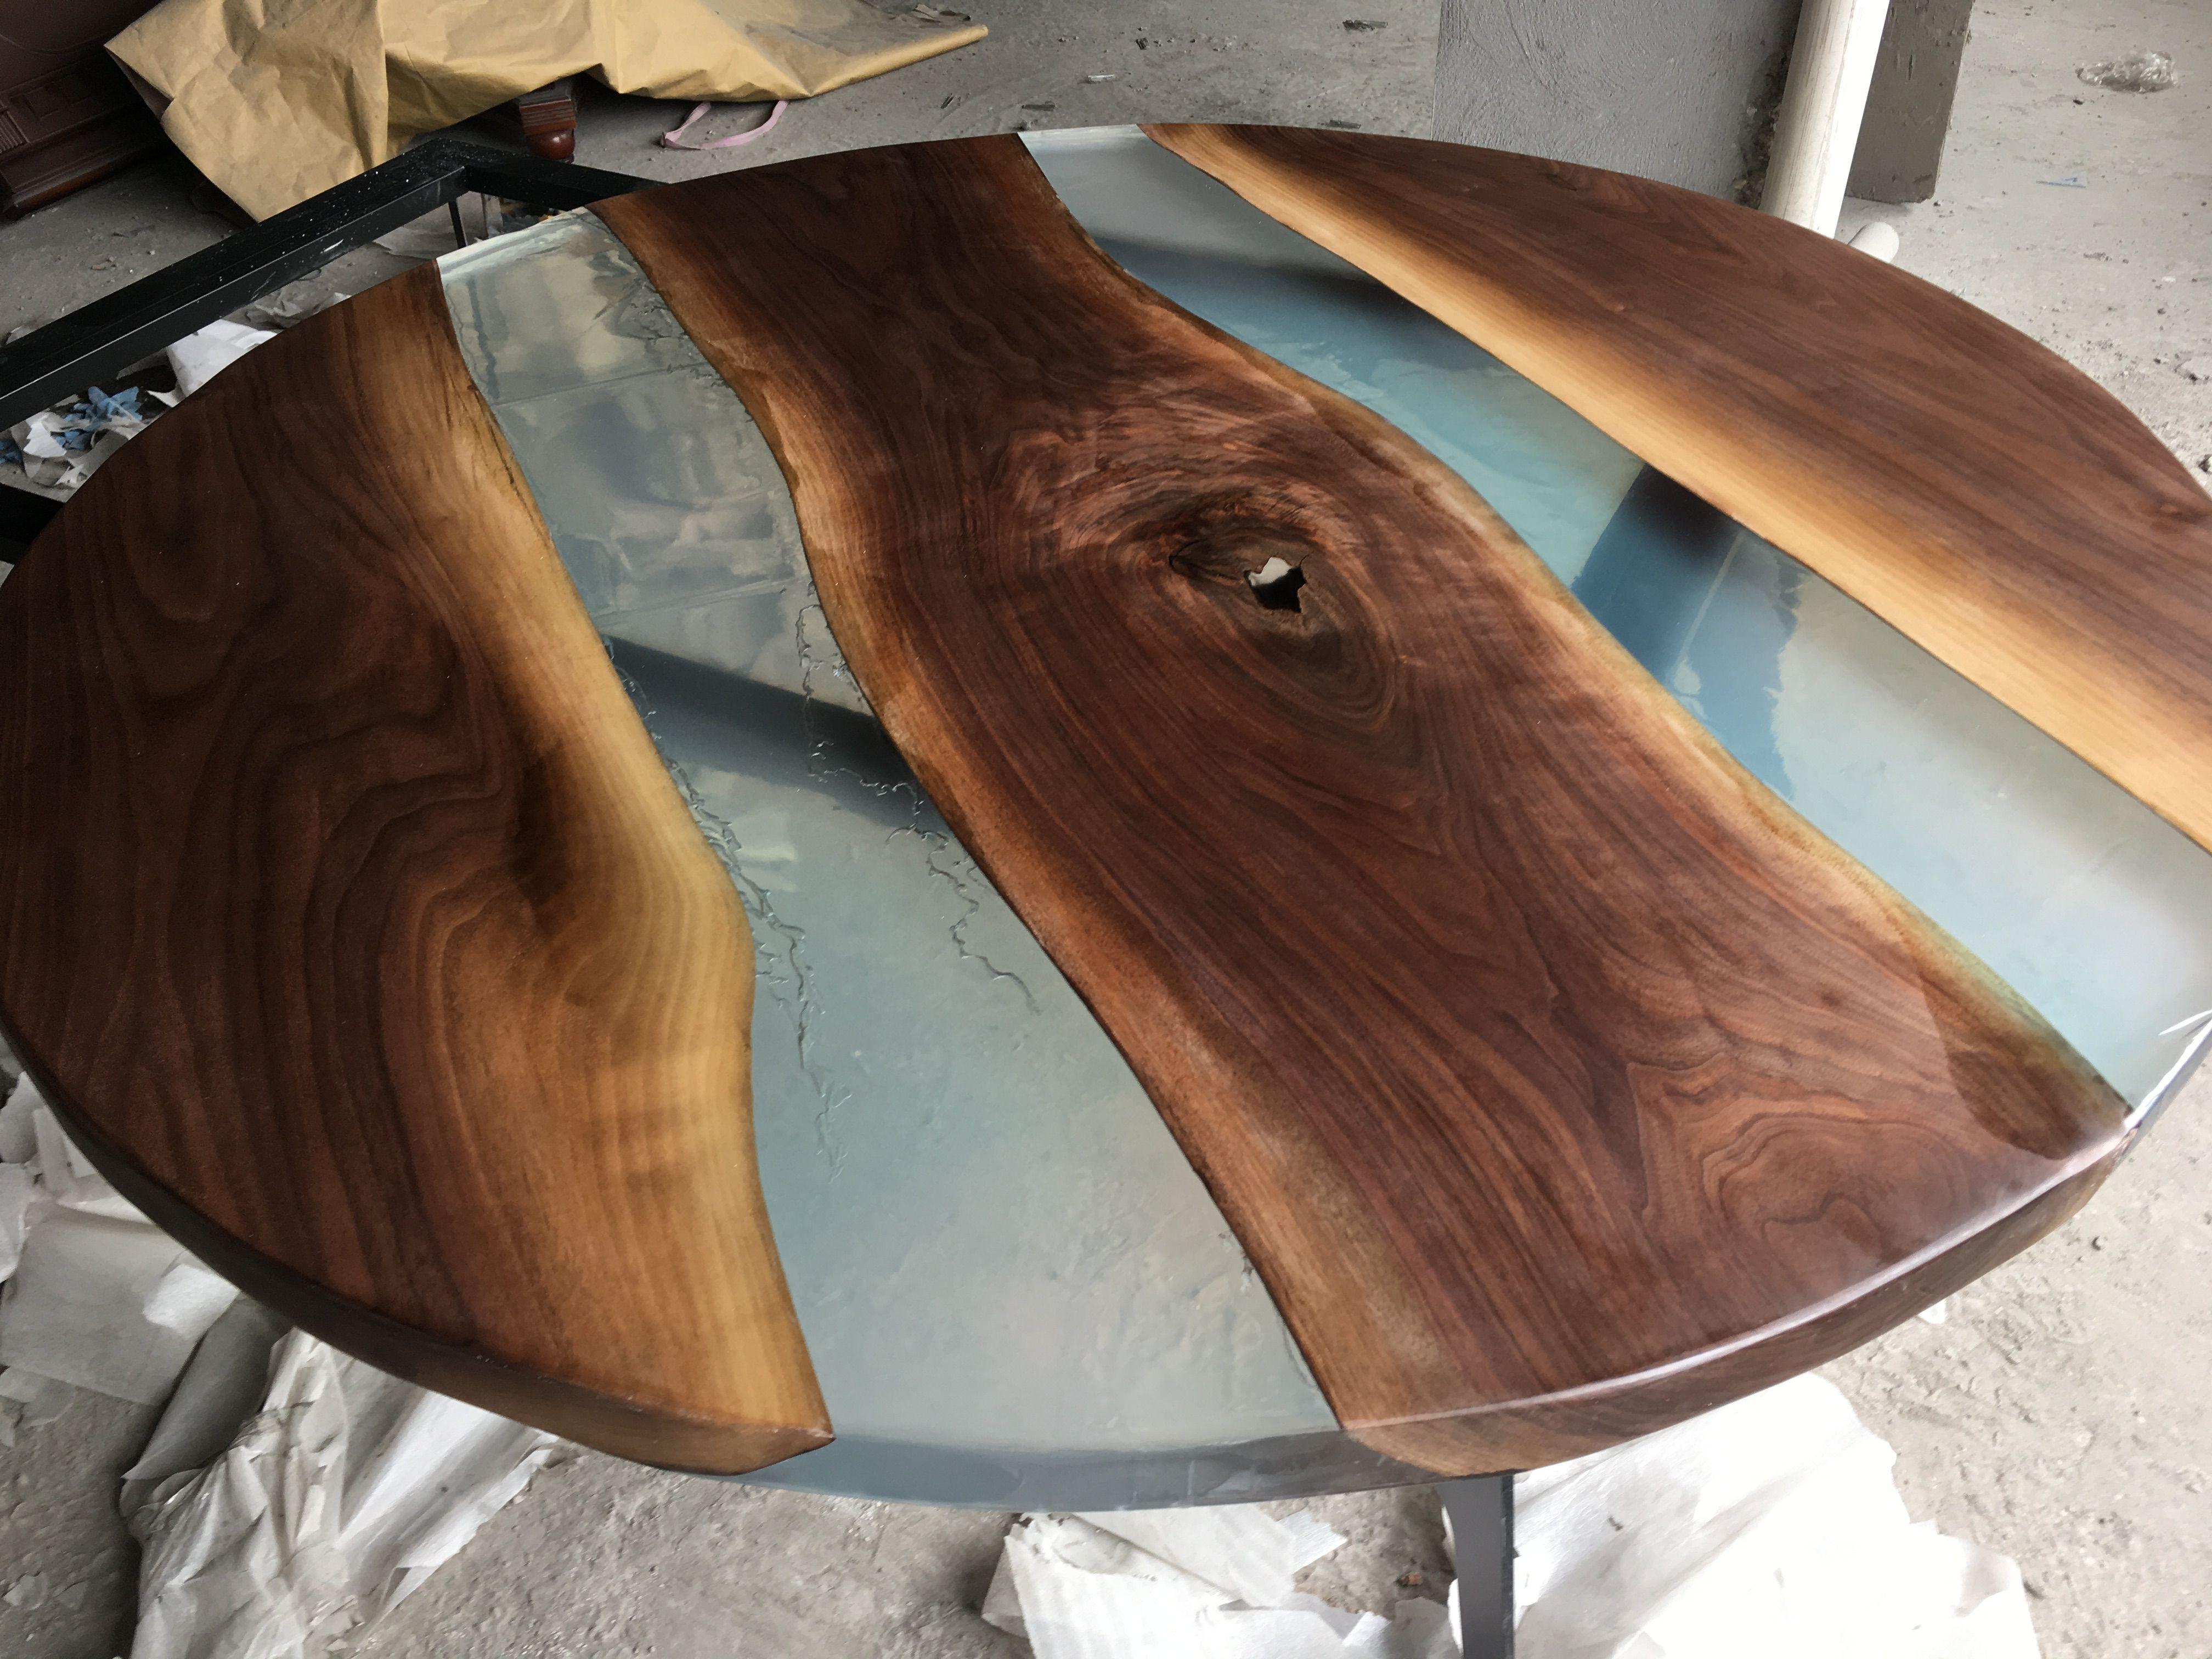 Epoxy Resin Wood Table 8613867774190 Epoxy Resin Wood Wood Table Epoxy Wood Table